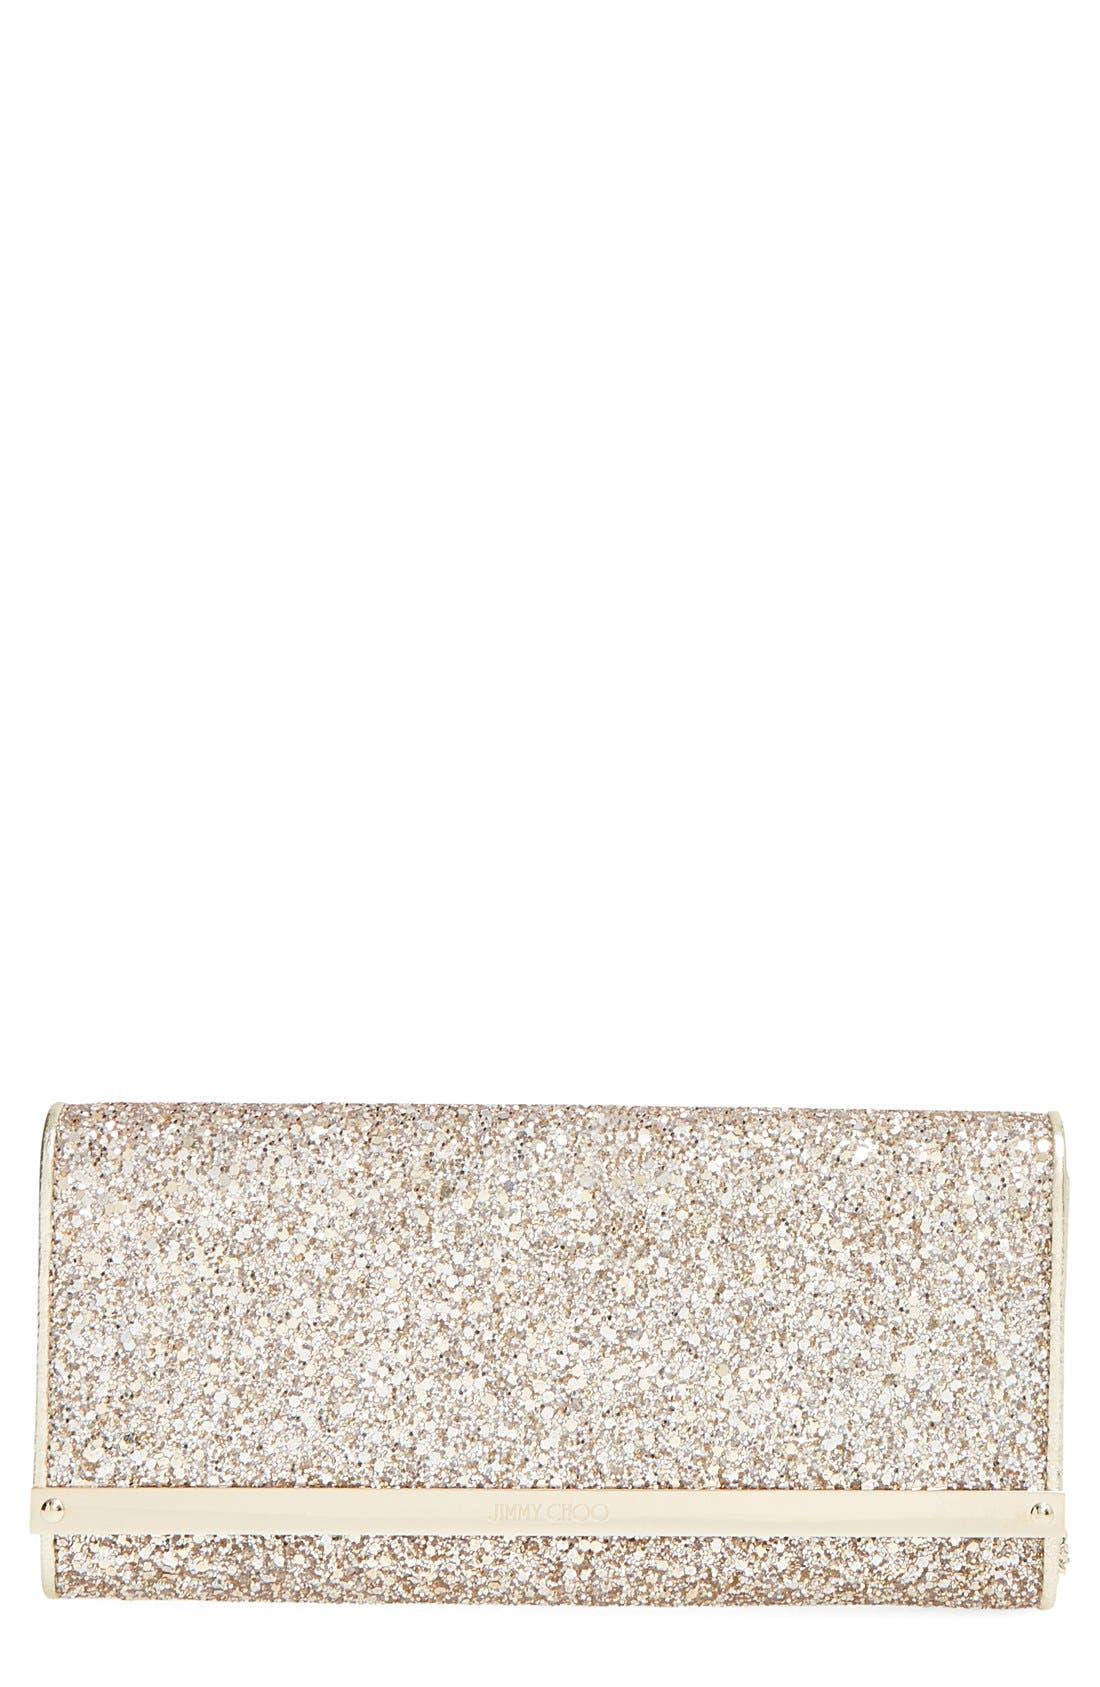 JIMMY CHOO, 'Milla' Glitter Clutch, Main thumbnail 1, color, 250